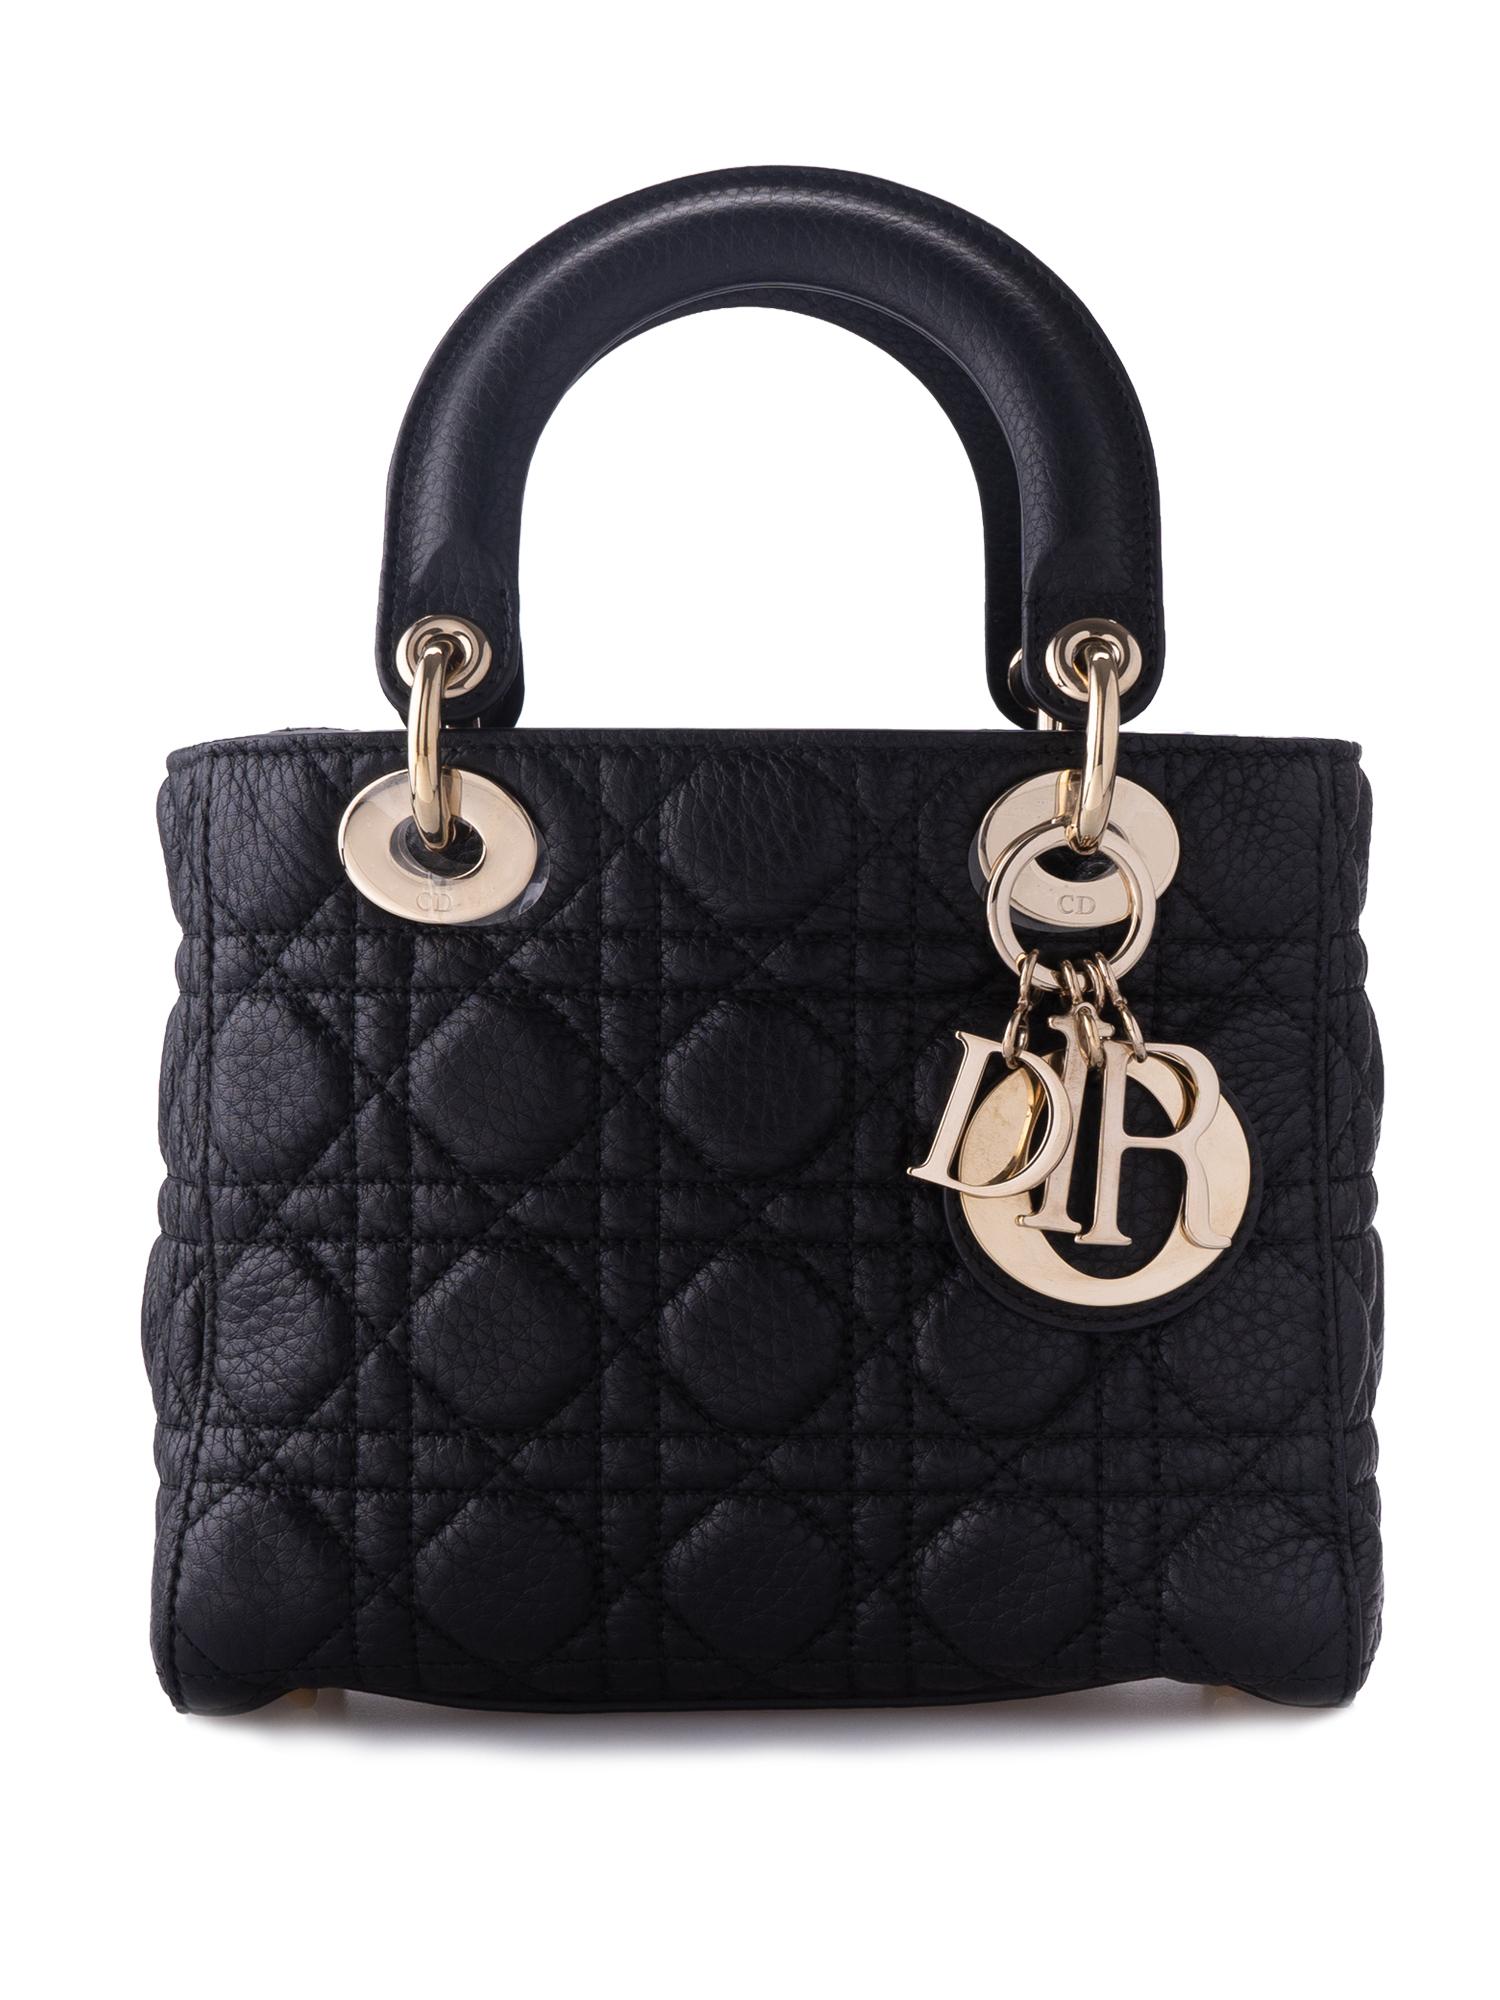 Christian Dior Mini Lady Black